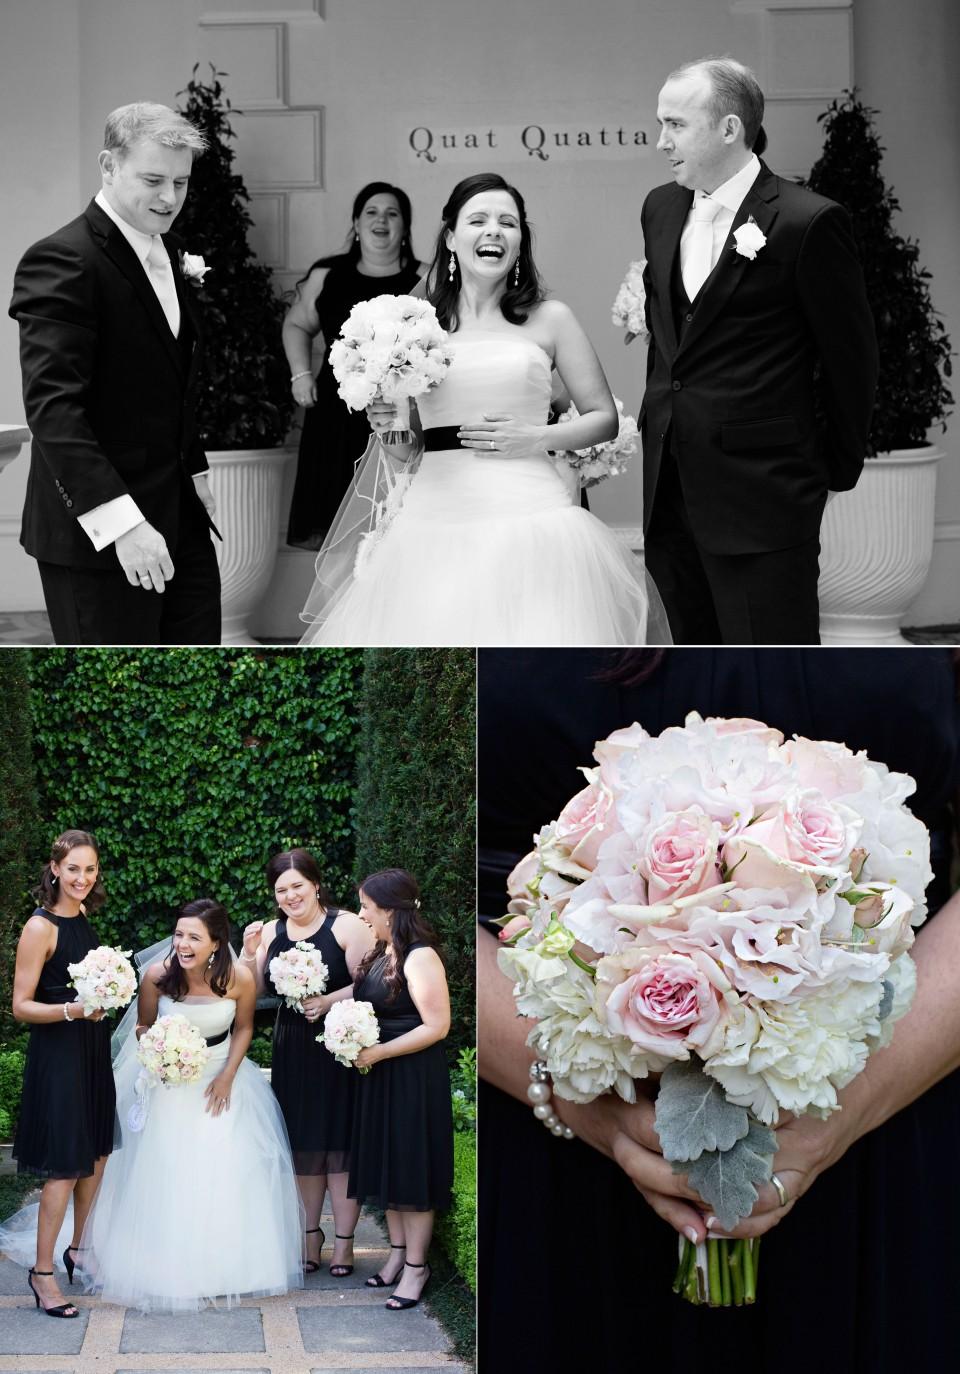 Quat Quatta Wedding Photography, Ripponlea